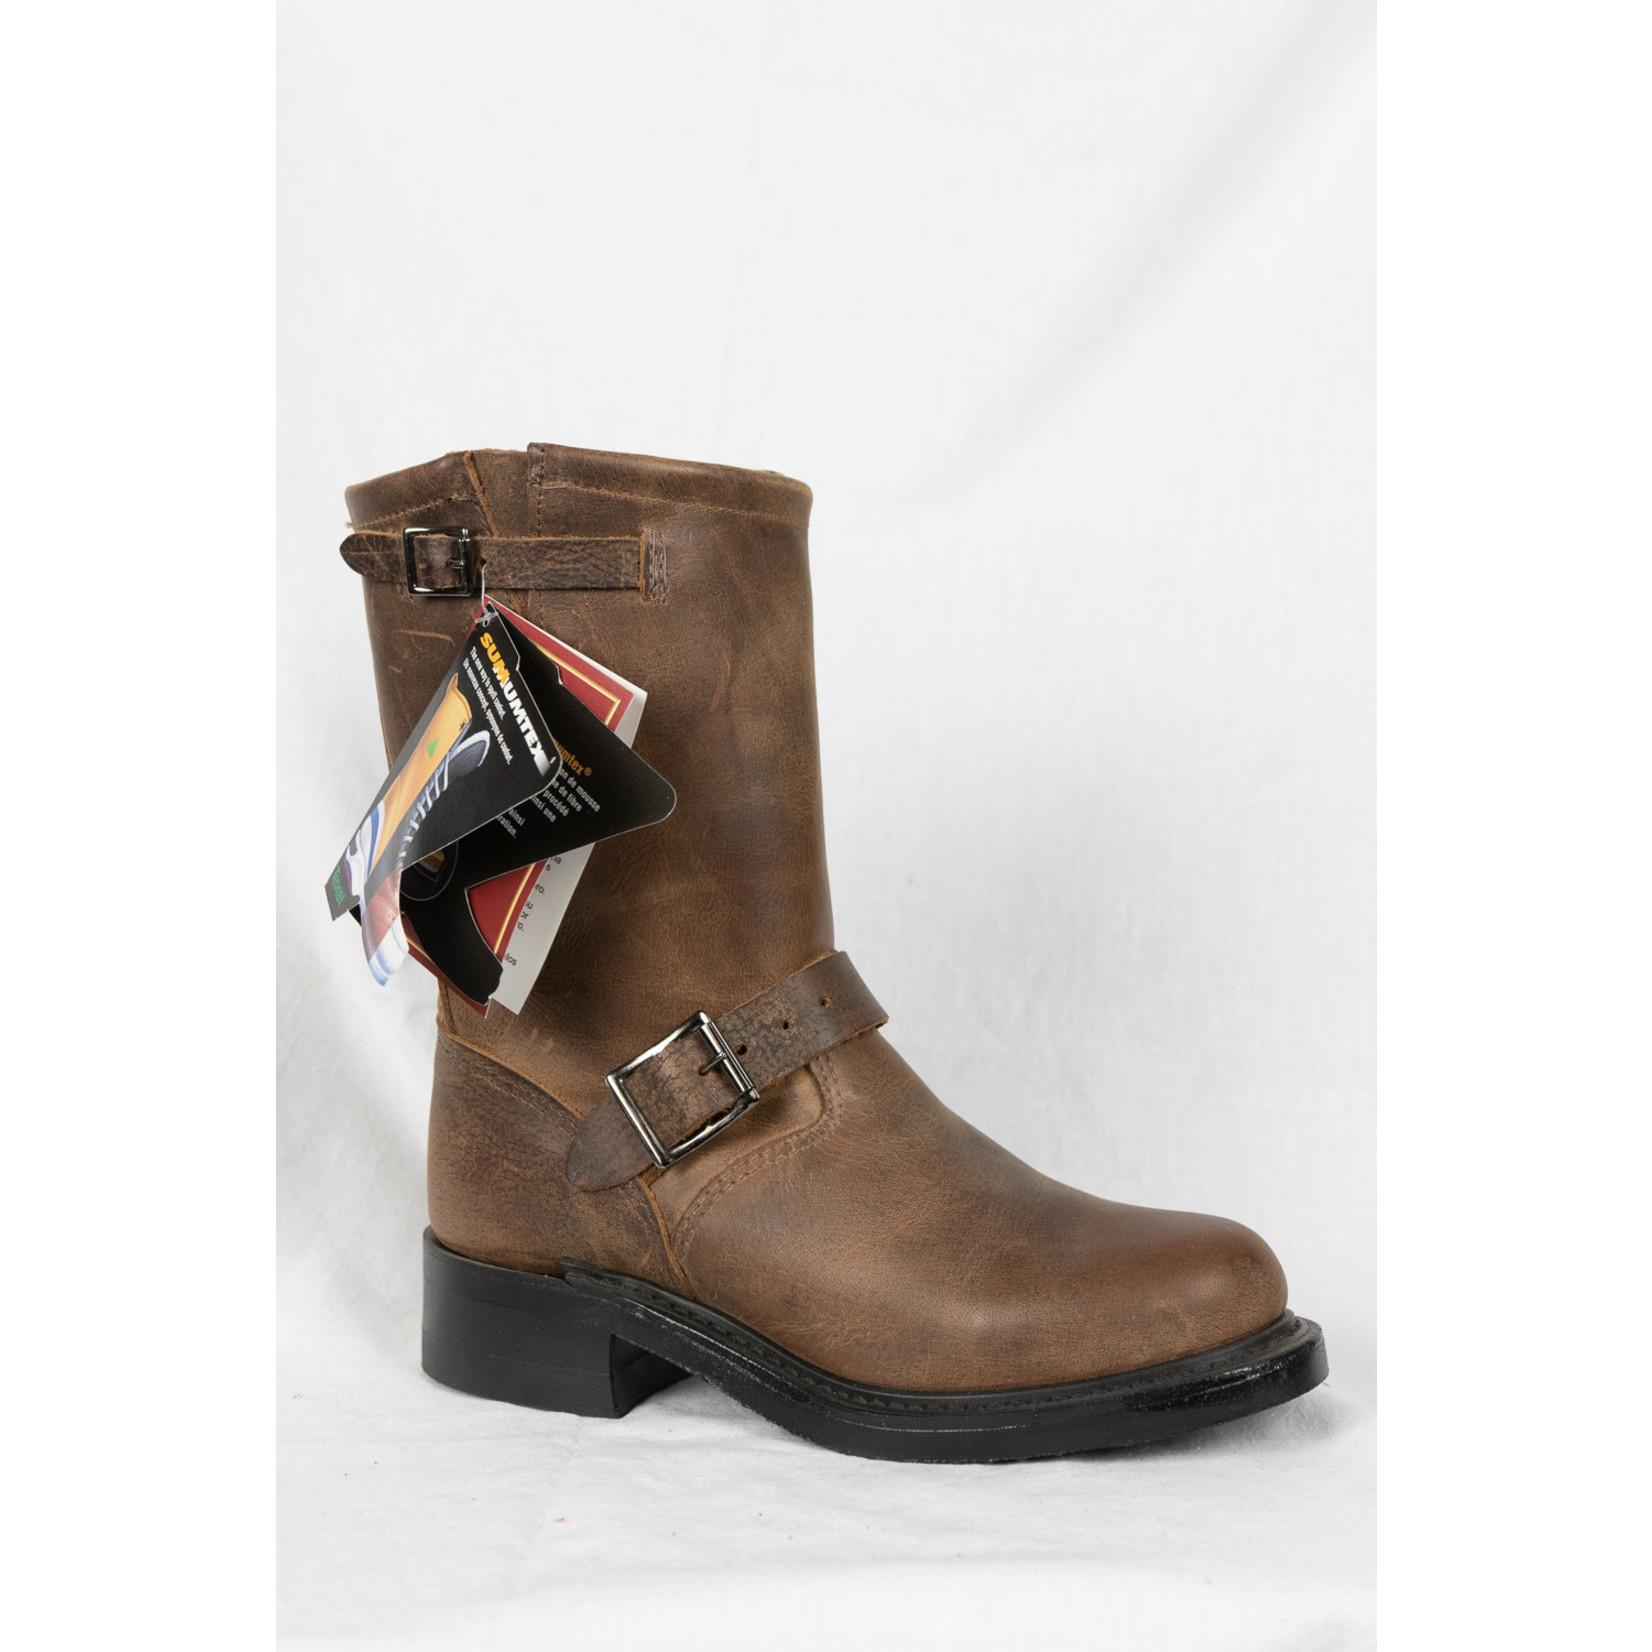 Boulet Boulet Women's Brown Leather Biker Boot 1164 Width 1C